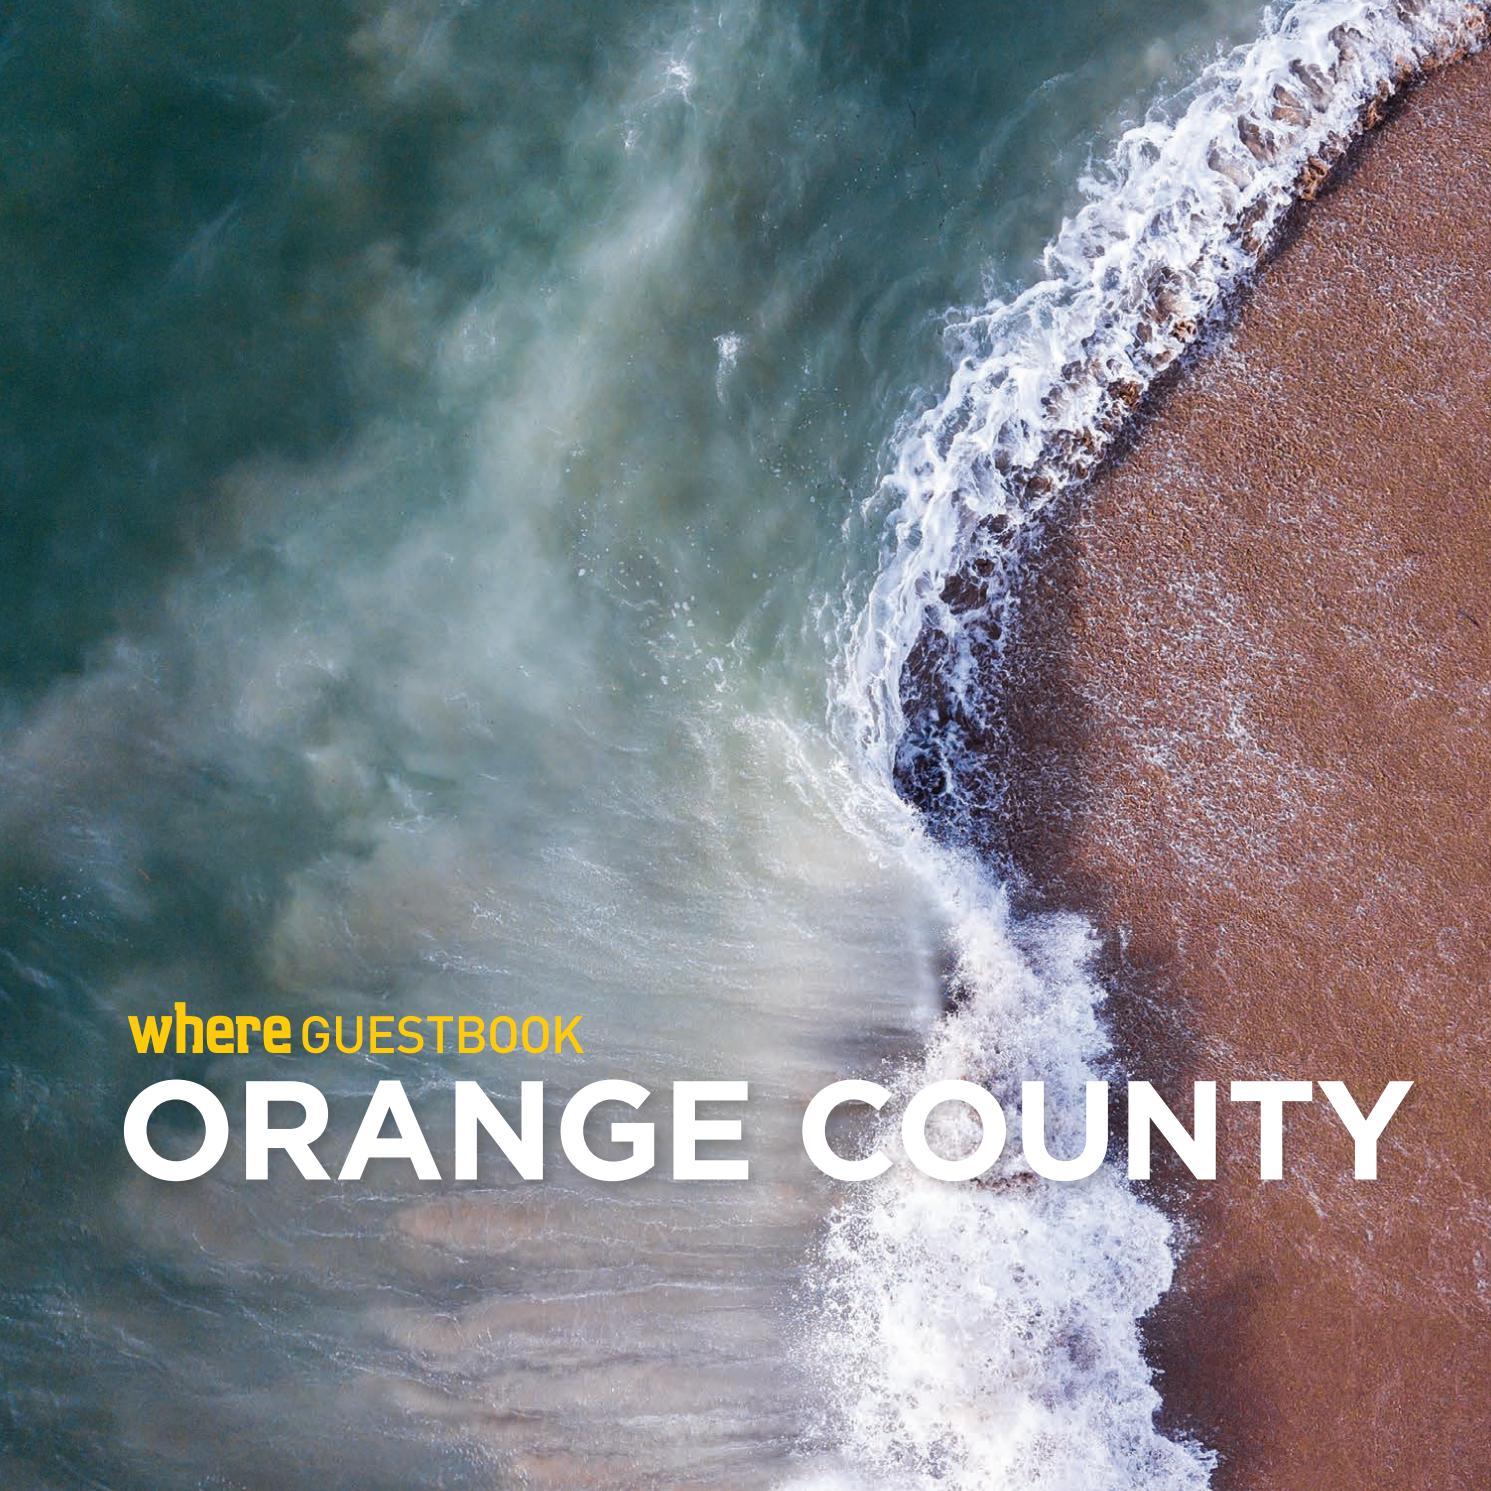 64b11c05d7 Where Guestbook Orange County 2018 by SoCalMedia - issuu